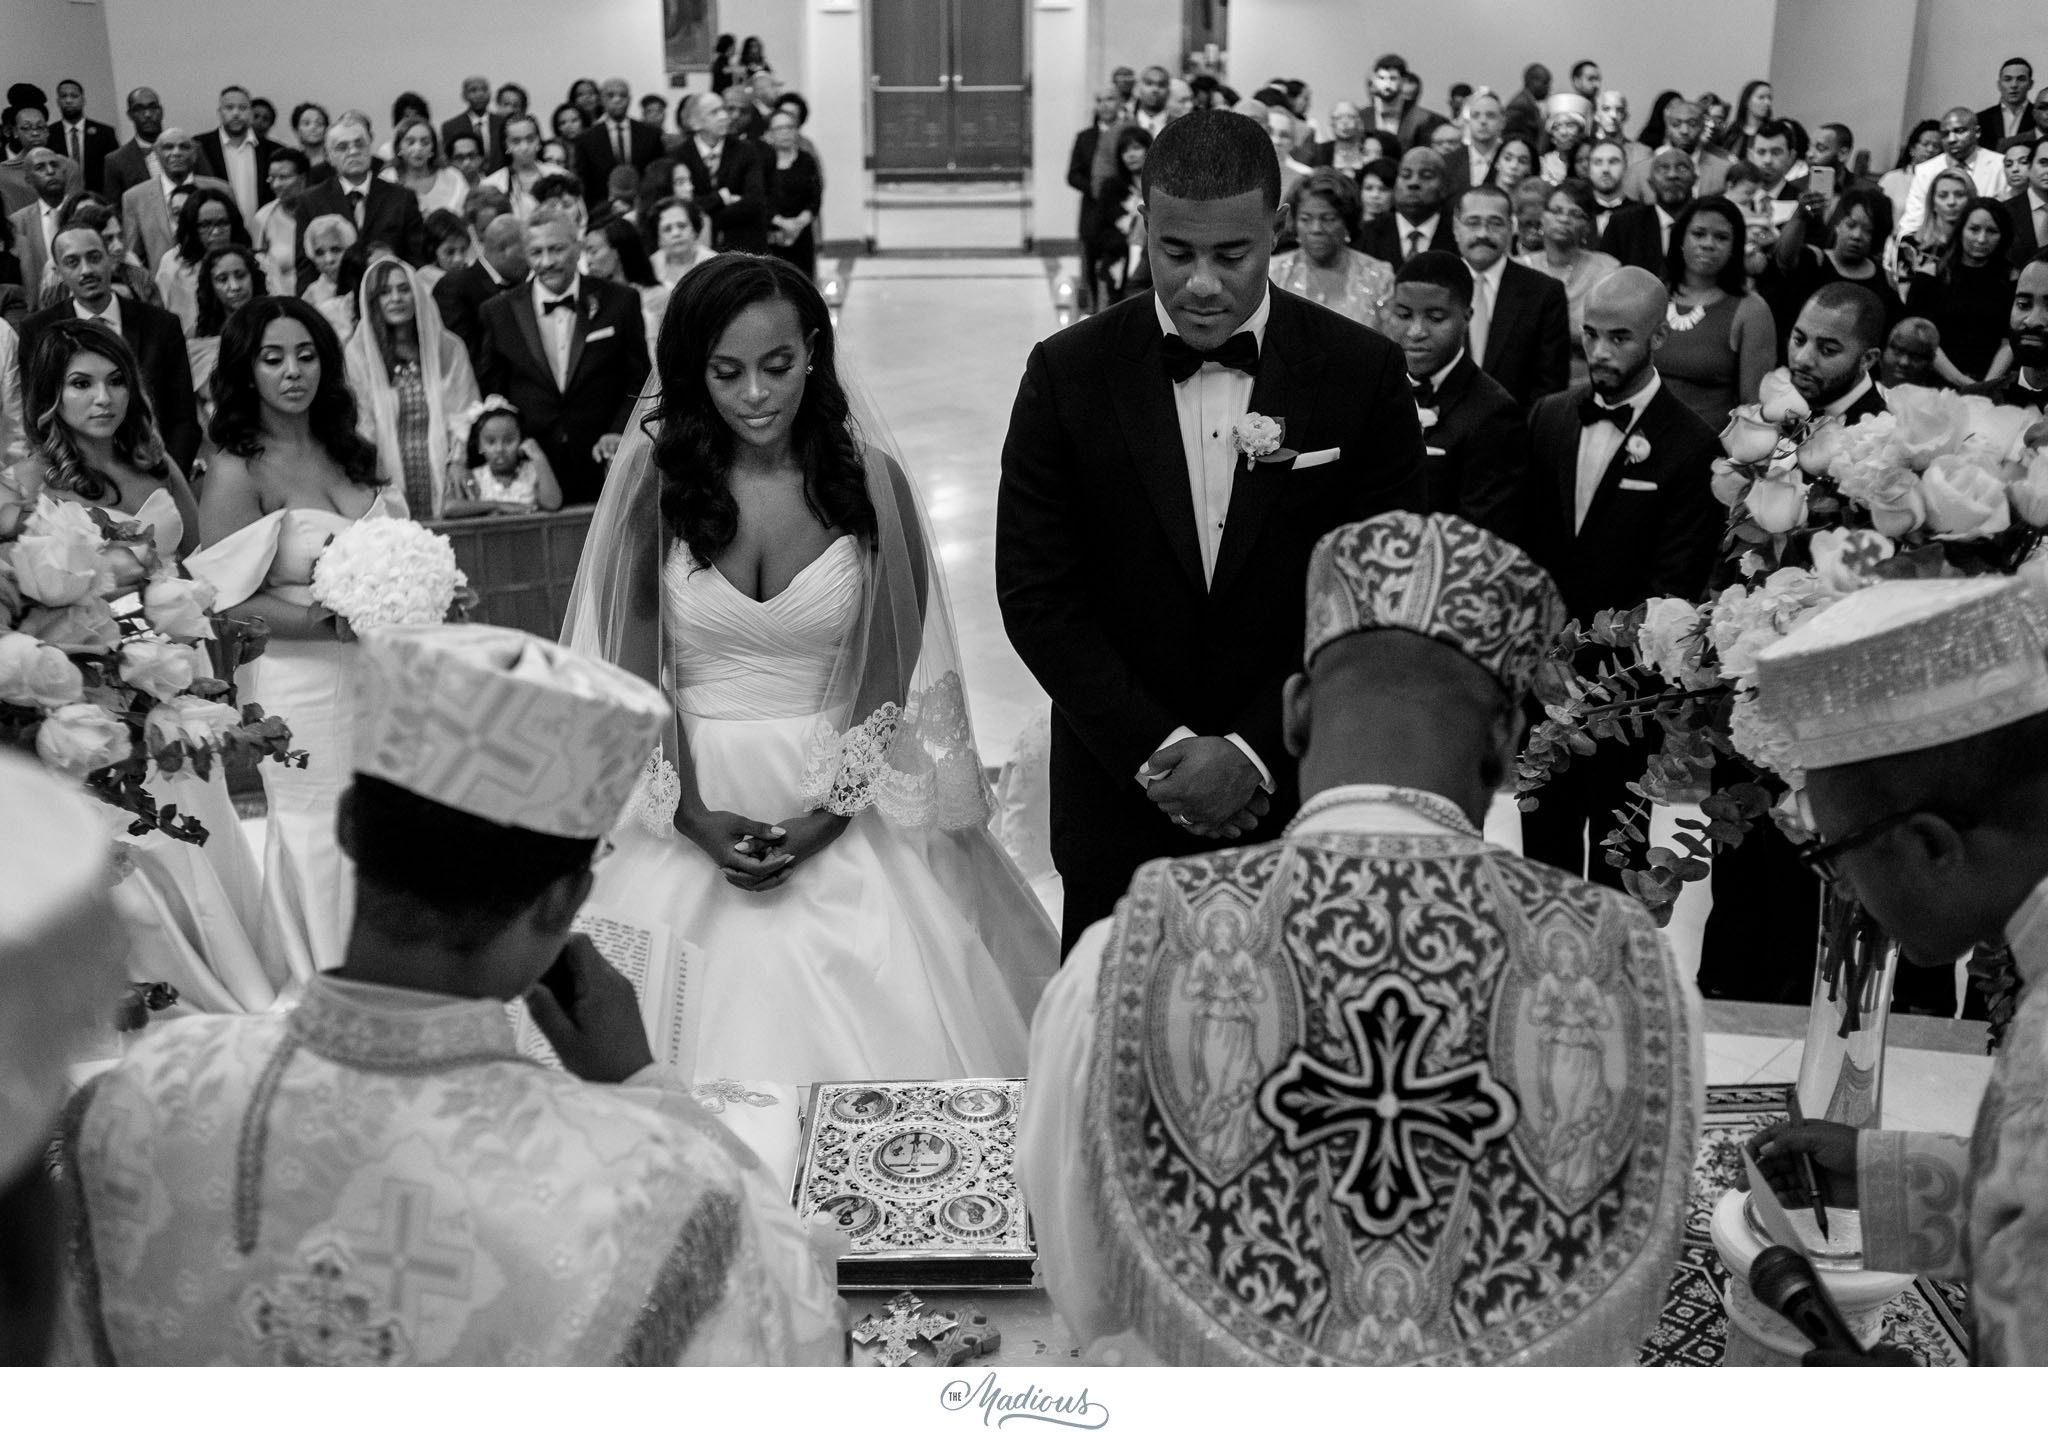 nmwa+wedding,+women+in+the+arts+wedding,+ethiopian+wedding,+dc+wedding+0090.jpg